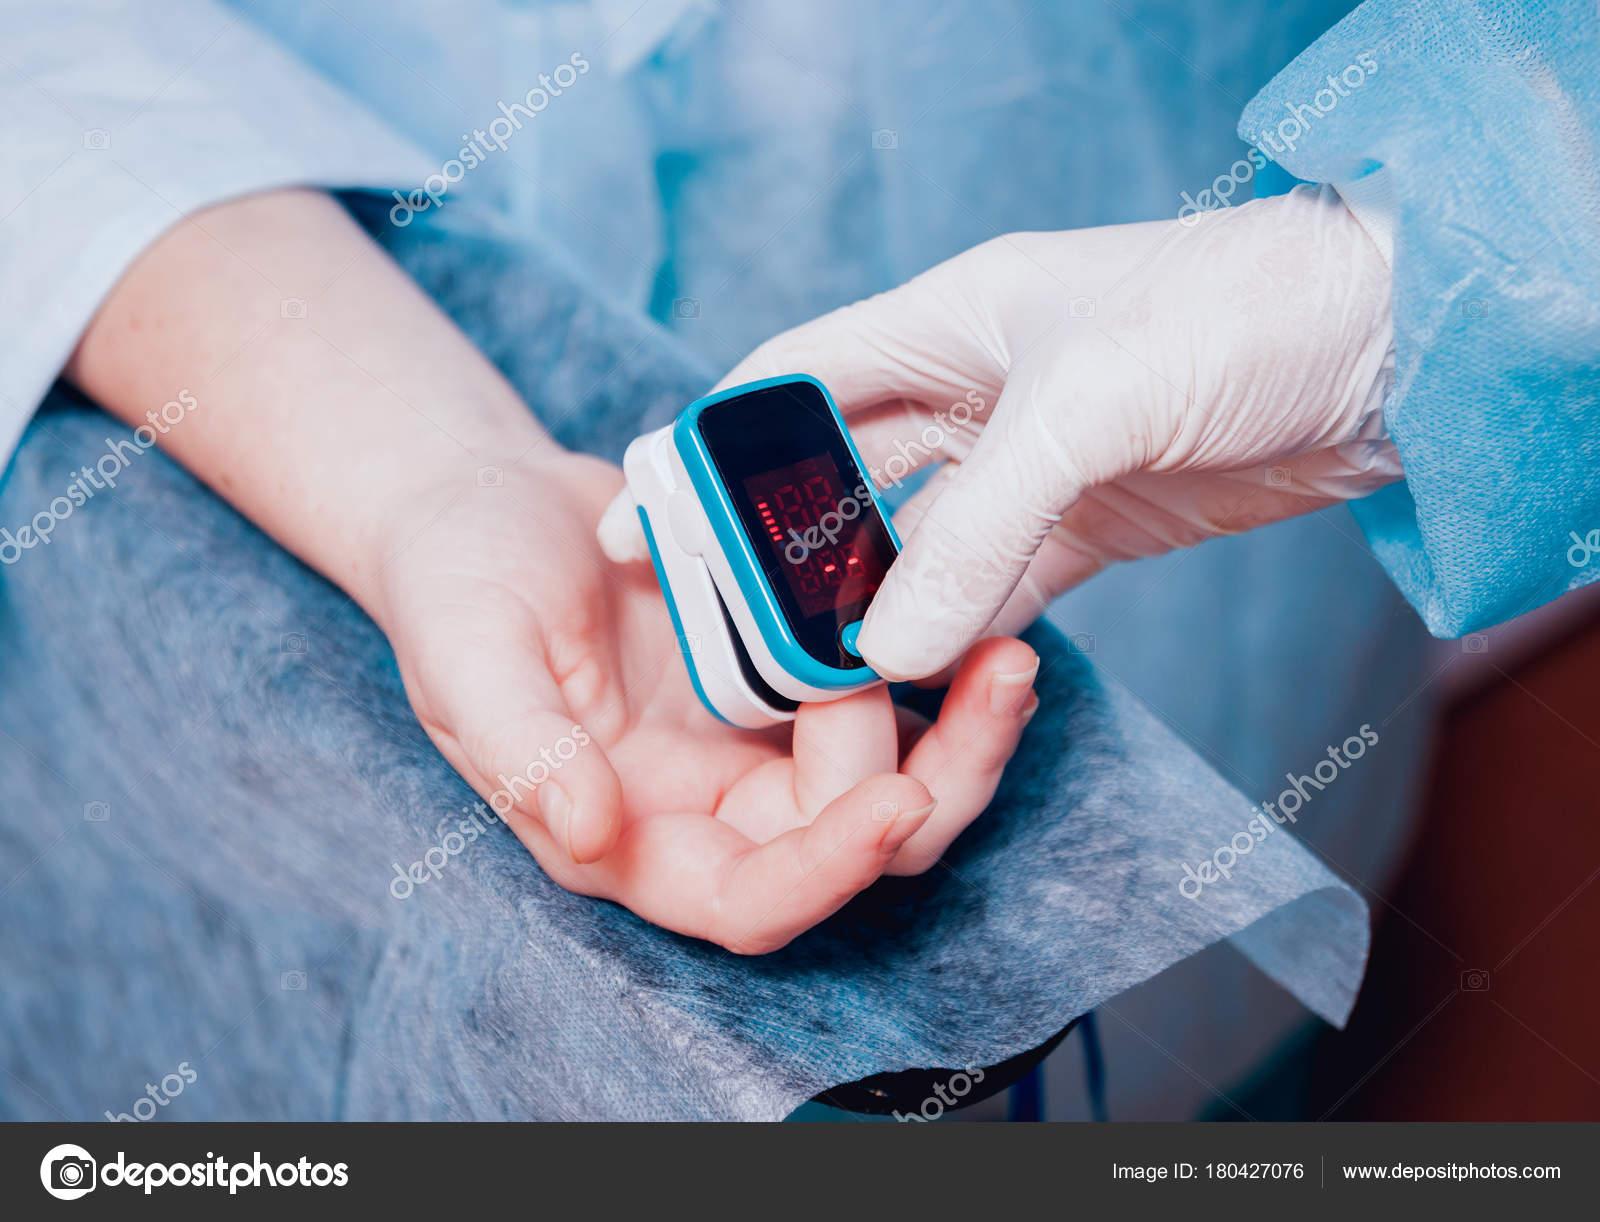 Pulse Oximeter Patient Hand Surgery Equipment — Stock Photo